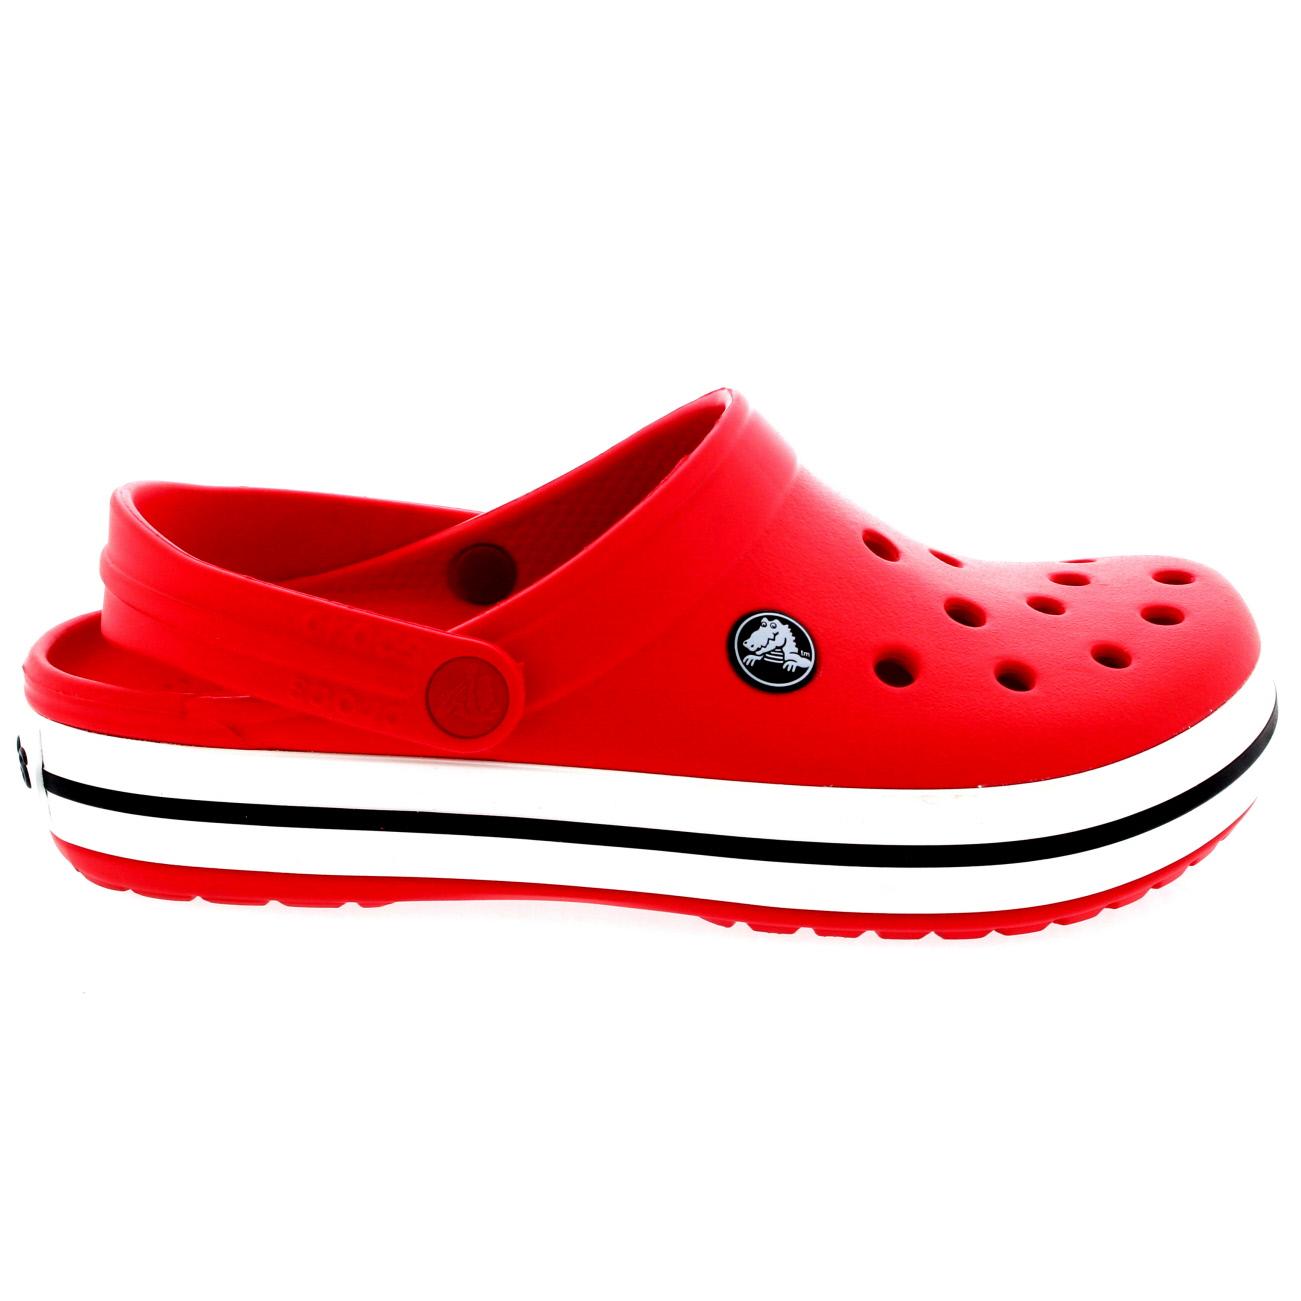 Womens Slipper Shoes Uk